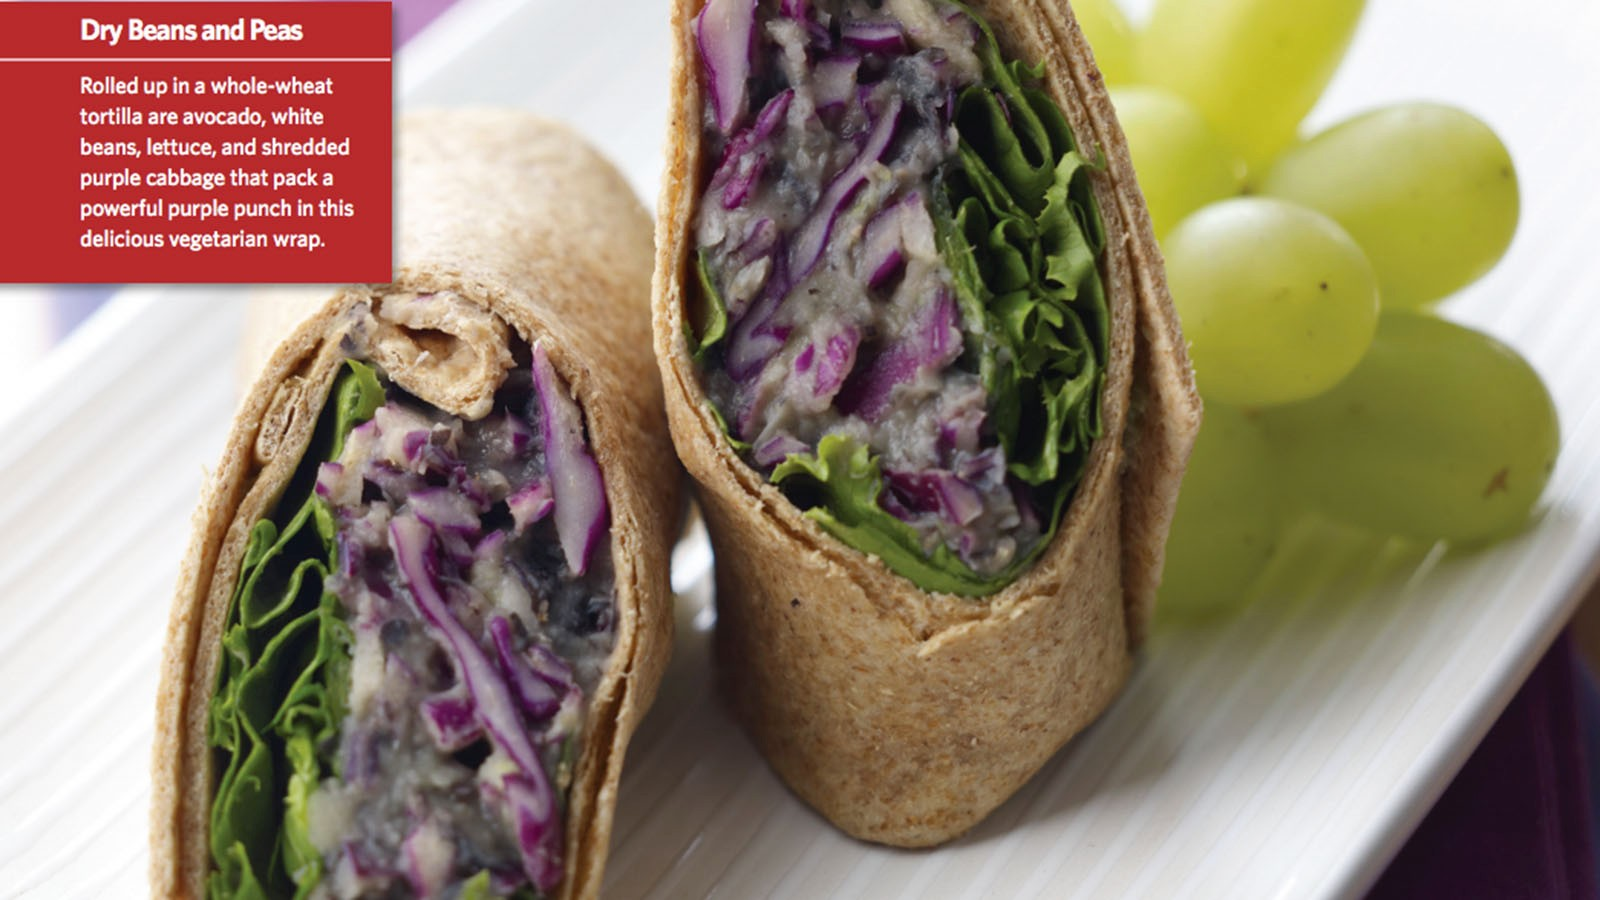 Purple Power Bean Wrap Top Recipe For School Lunches Cnn